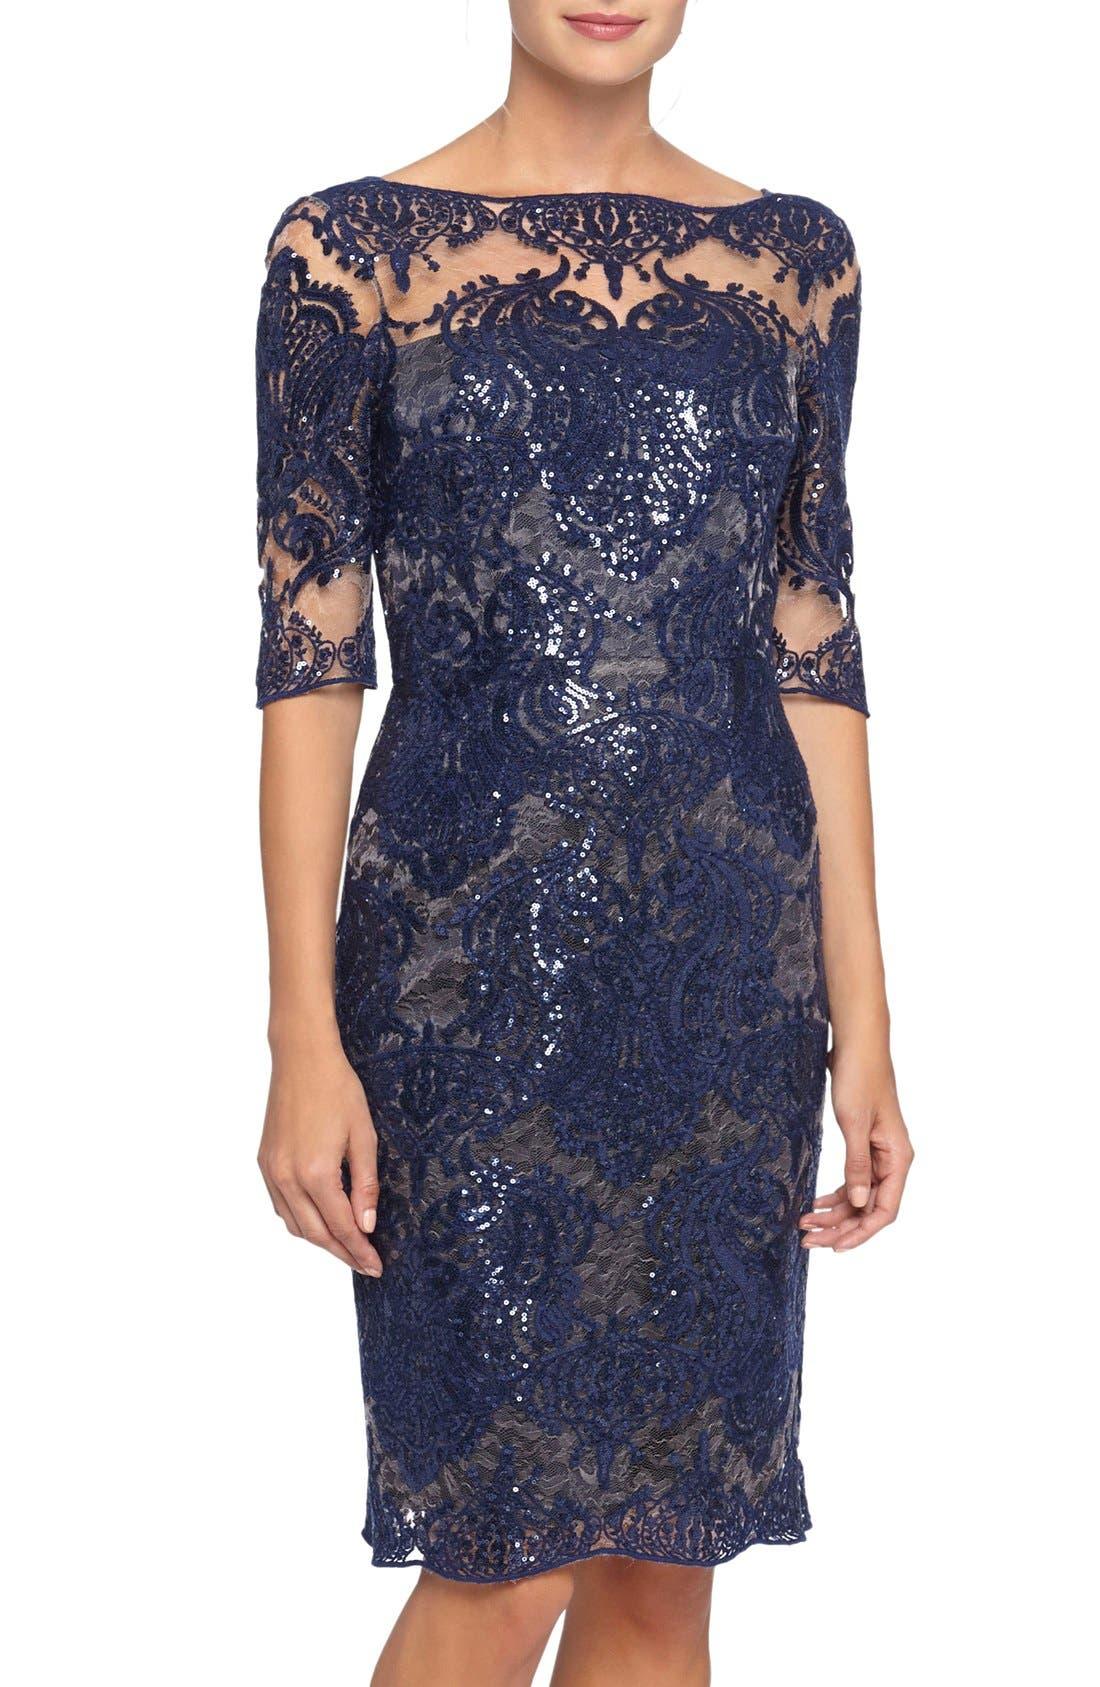 Alternate Image 1 Selected - Tahari Sequin Lace Sheath Dress